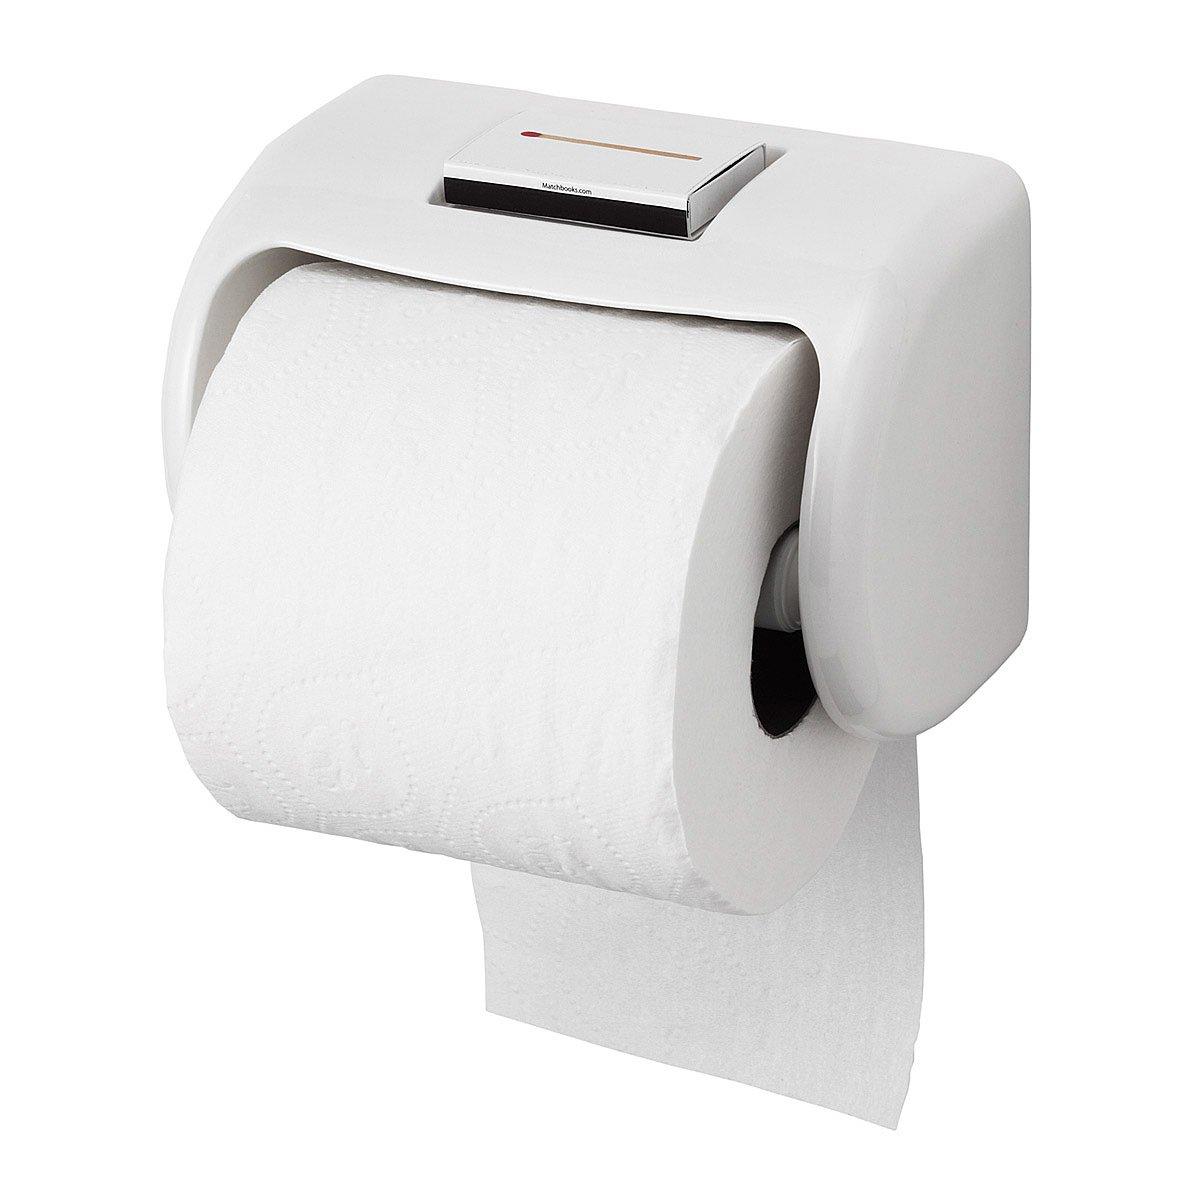 Matchbox Toilet Paper Dispenser 1 Thumbnail